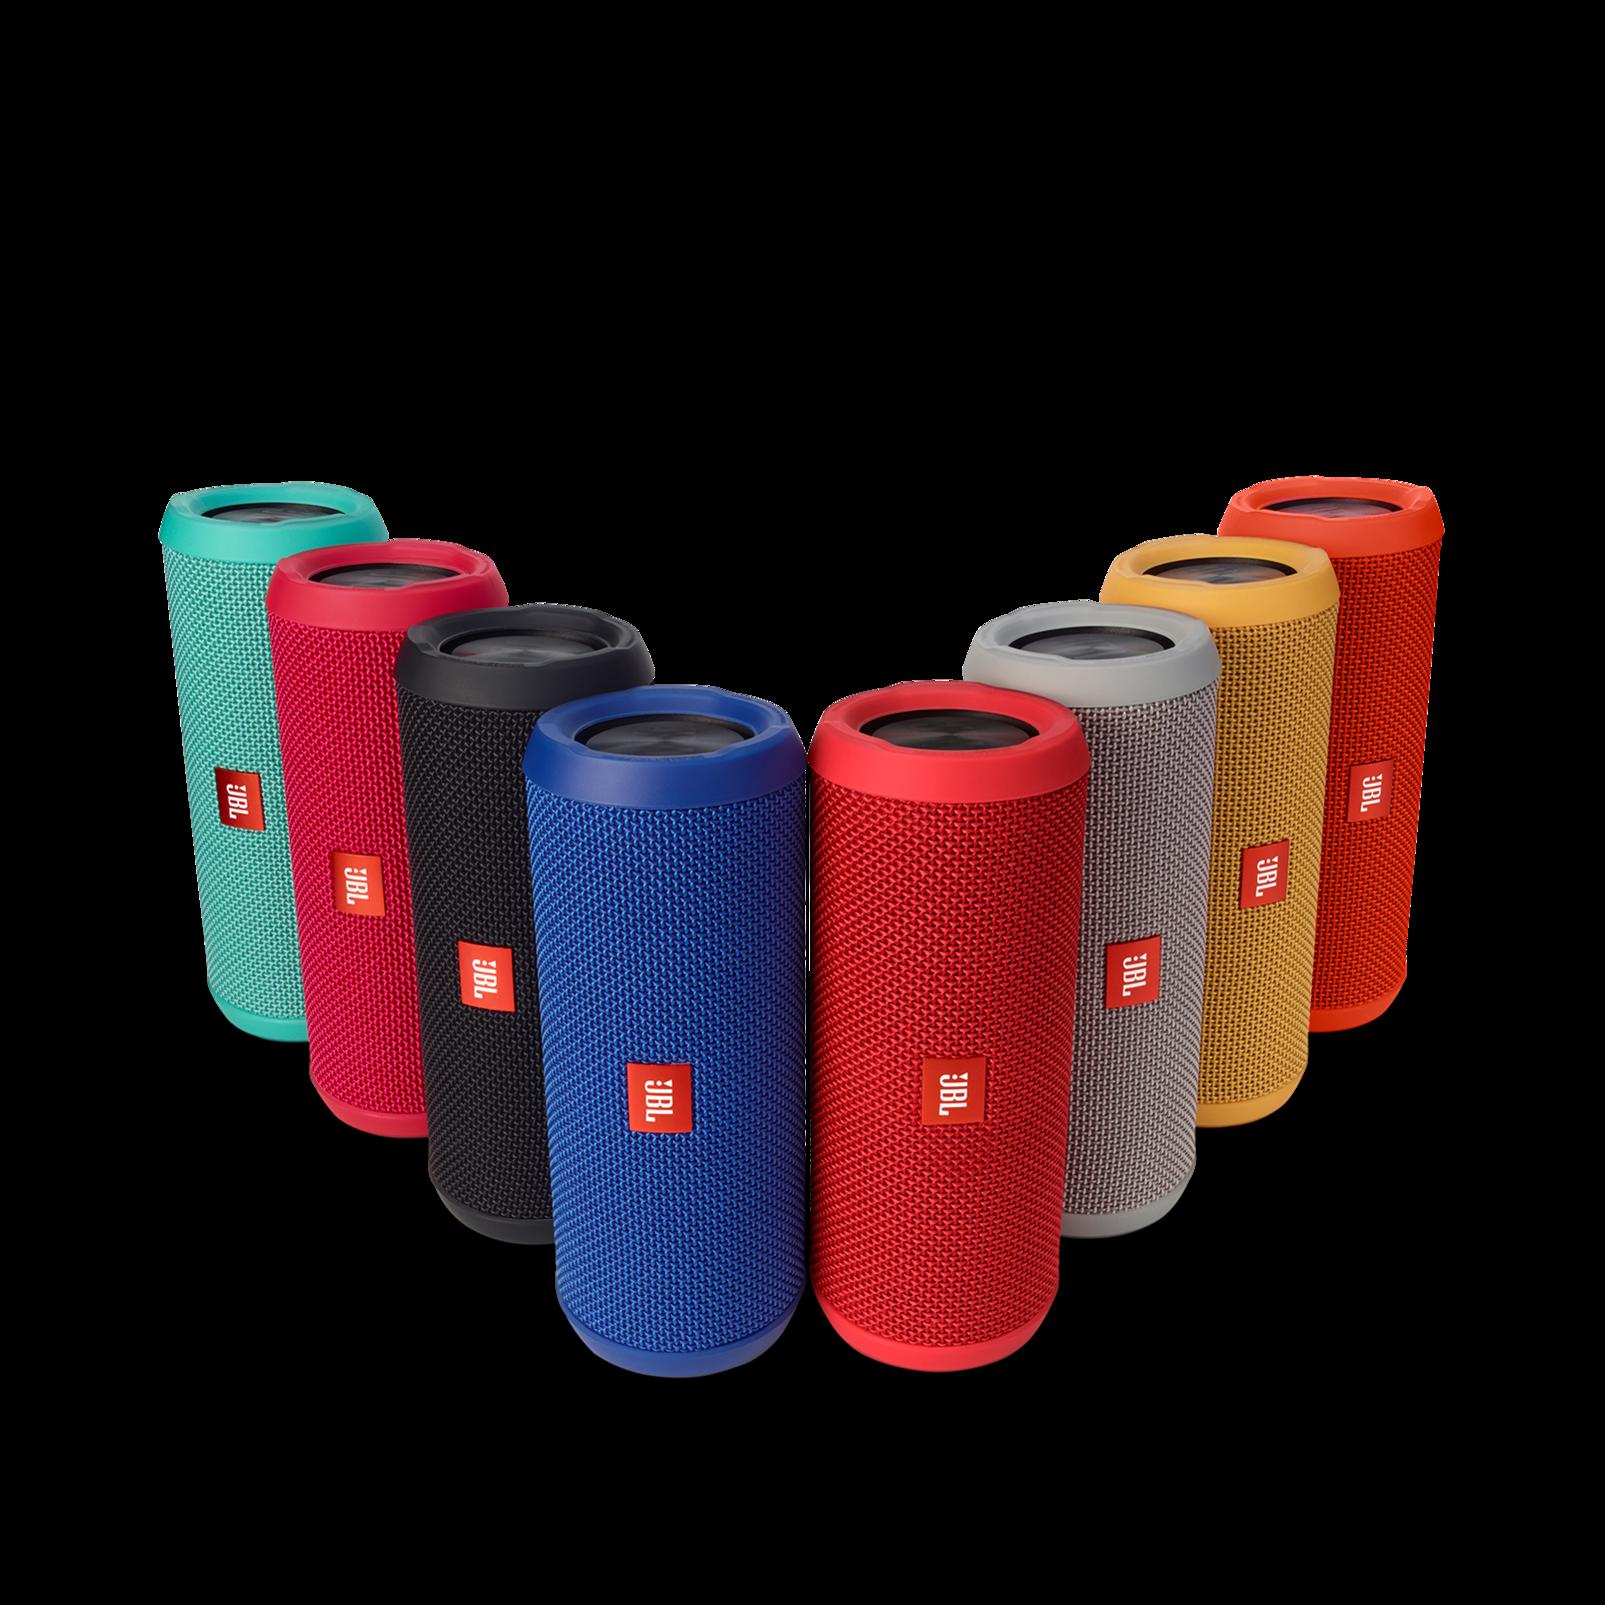 JBL Flip 3 - Black - Splashproof portable Bluetooth speaker with powerful sound and speakerphone technology - Detailshot 5